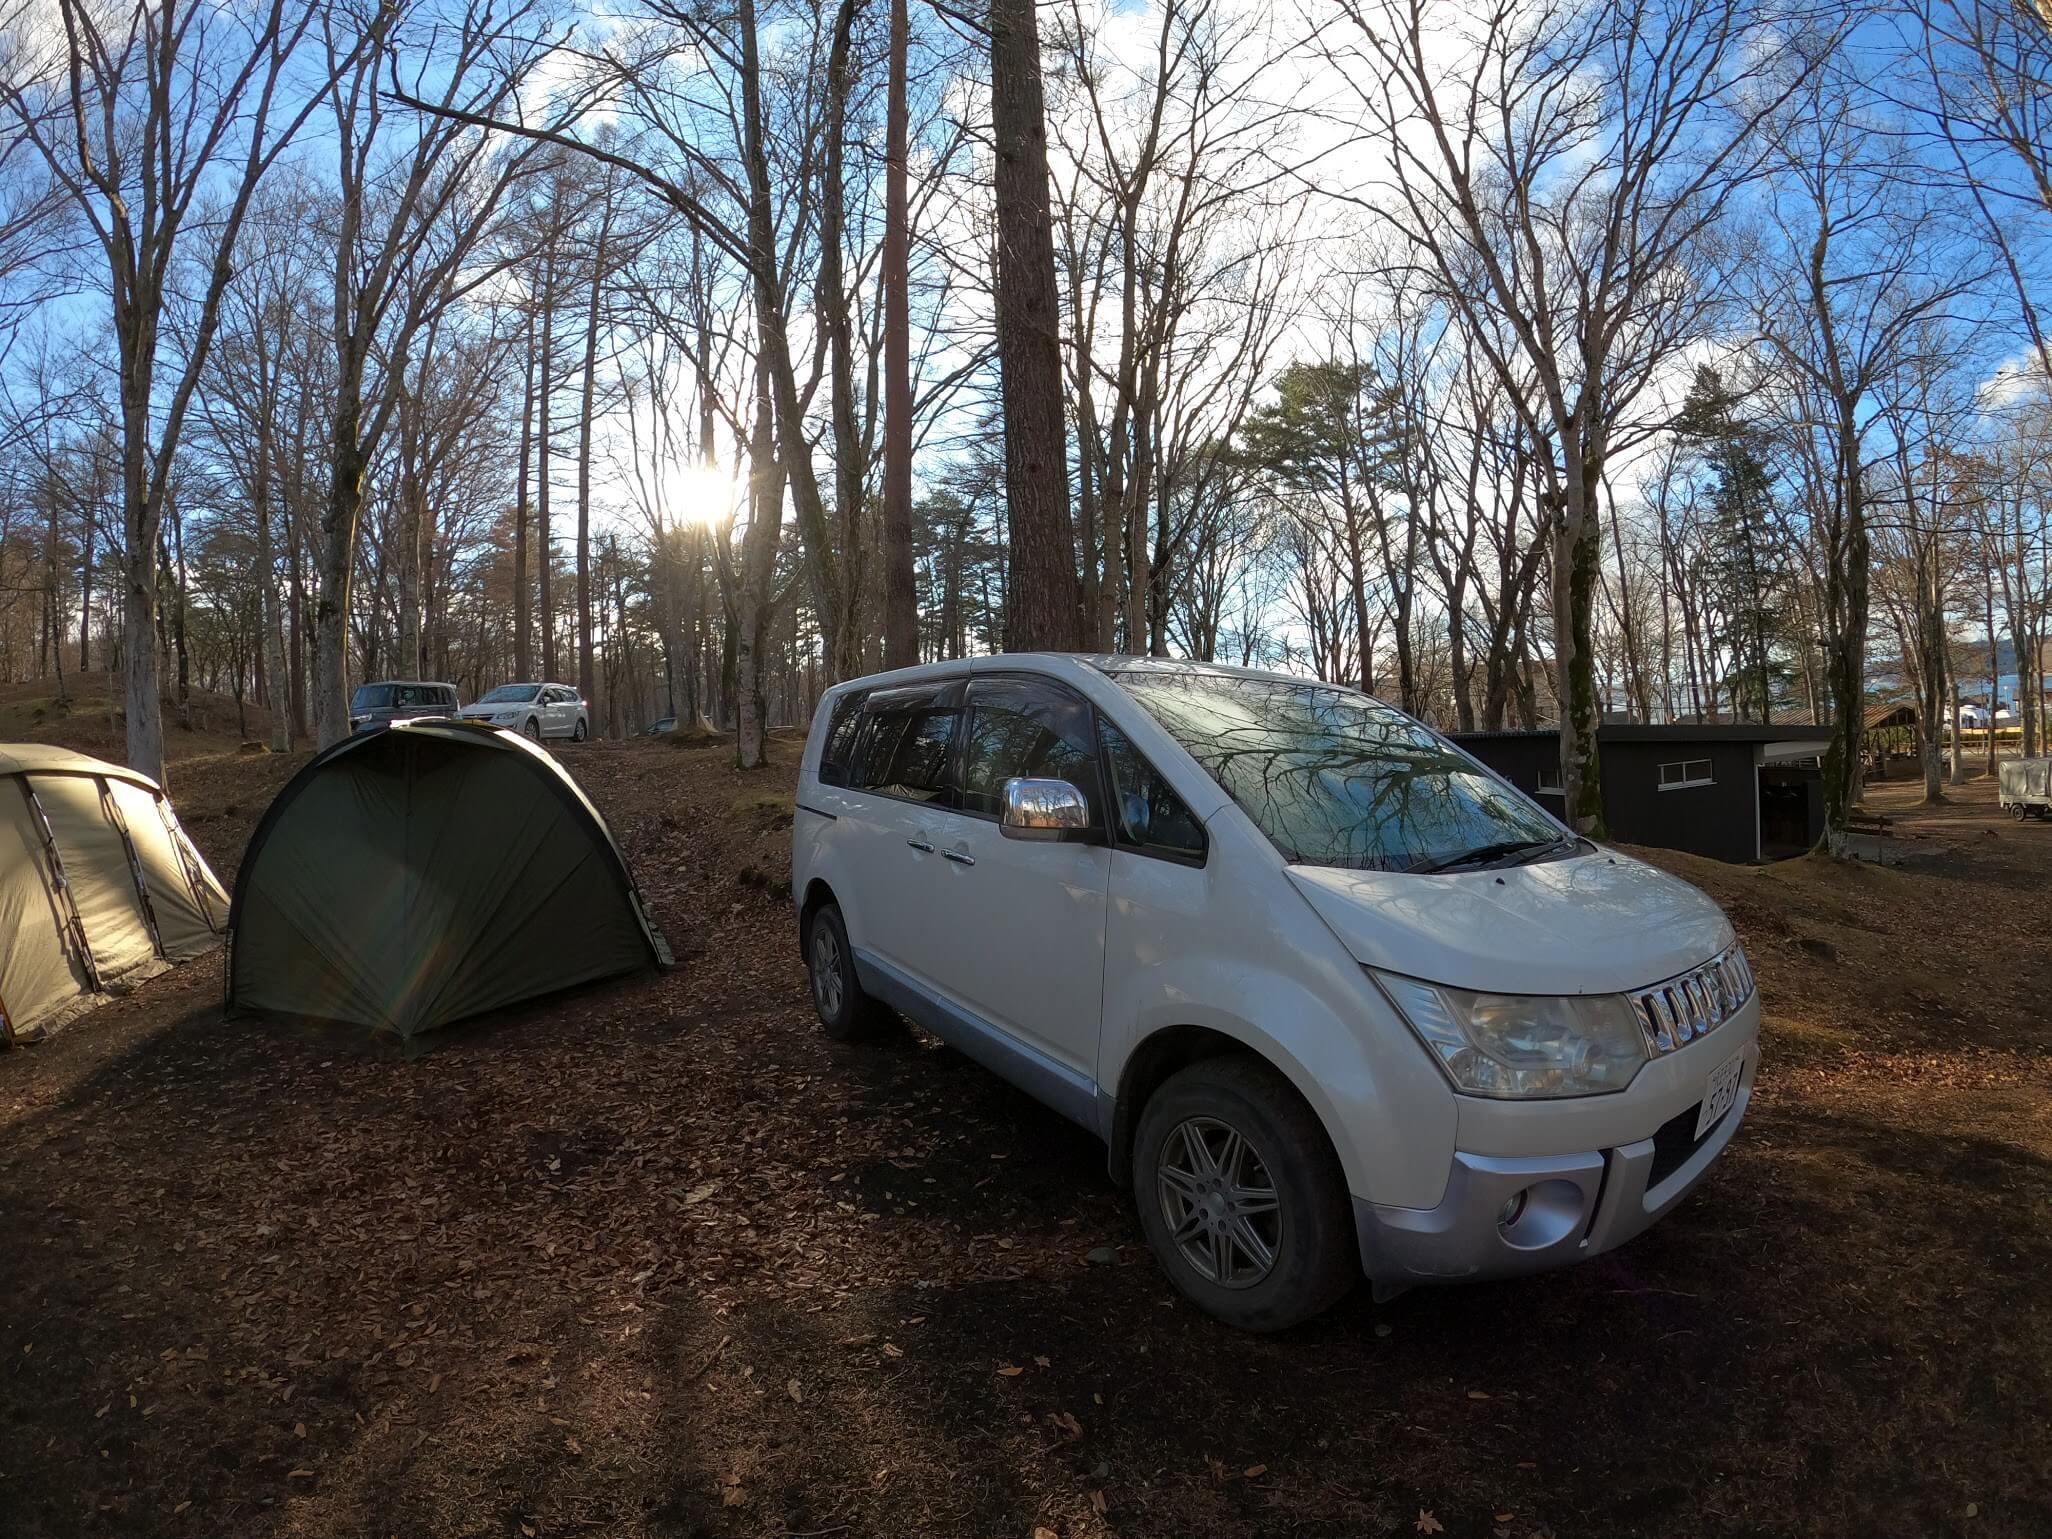 the 508 | Camp(旧:撫岳荘キャンプ場)山中湖ビュー